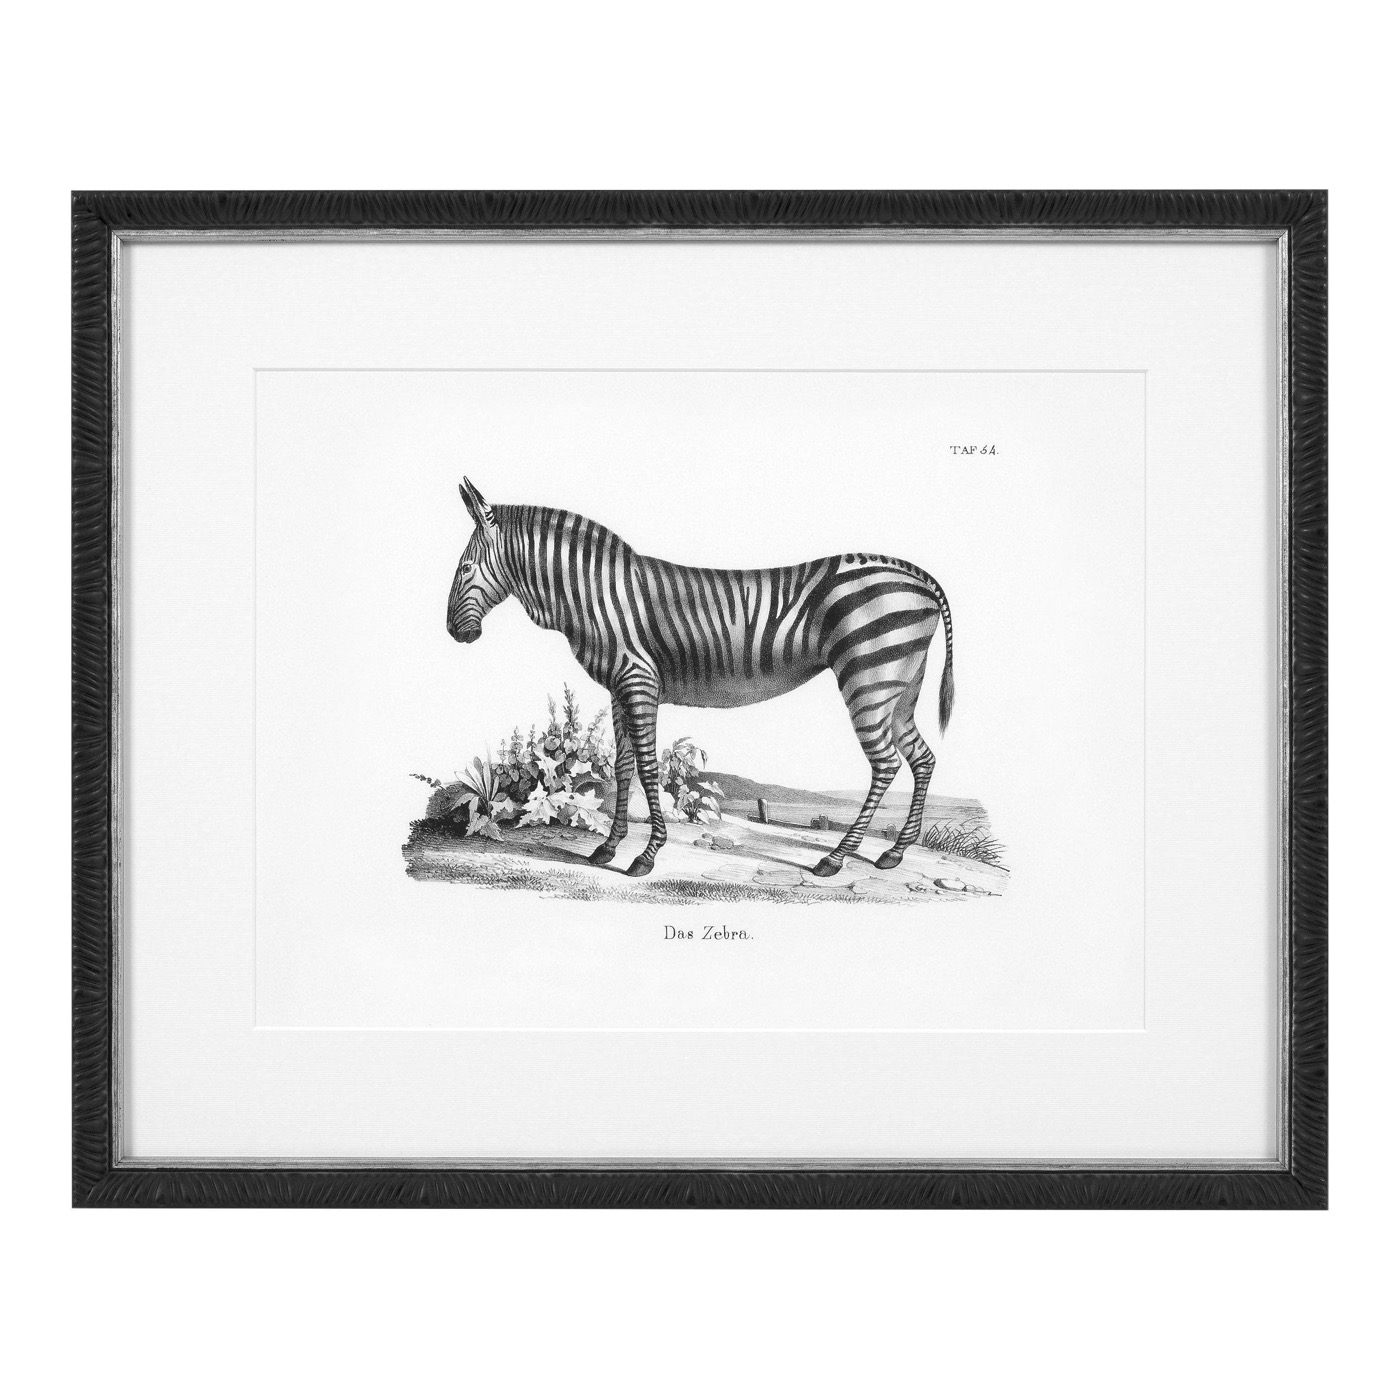 Zoology Animal Prints | Set of 6